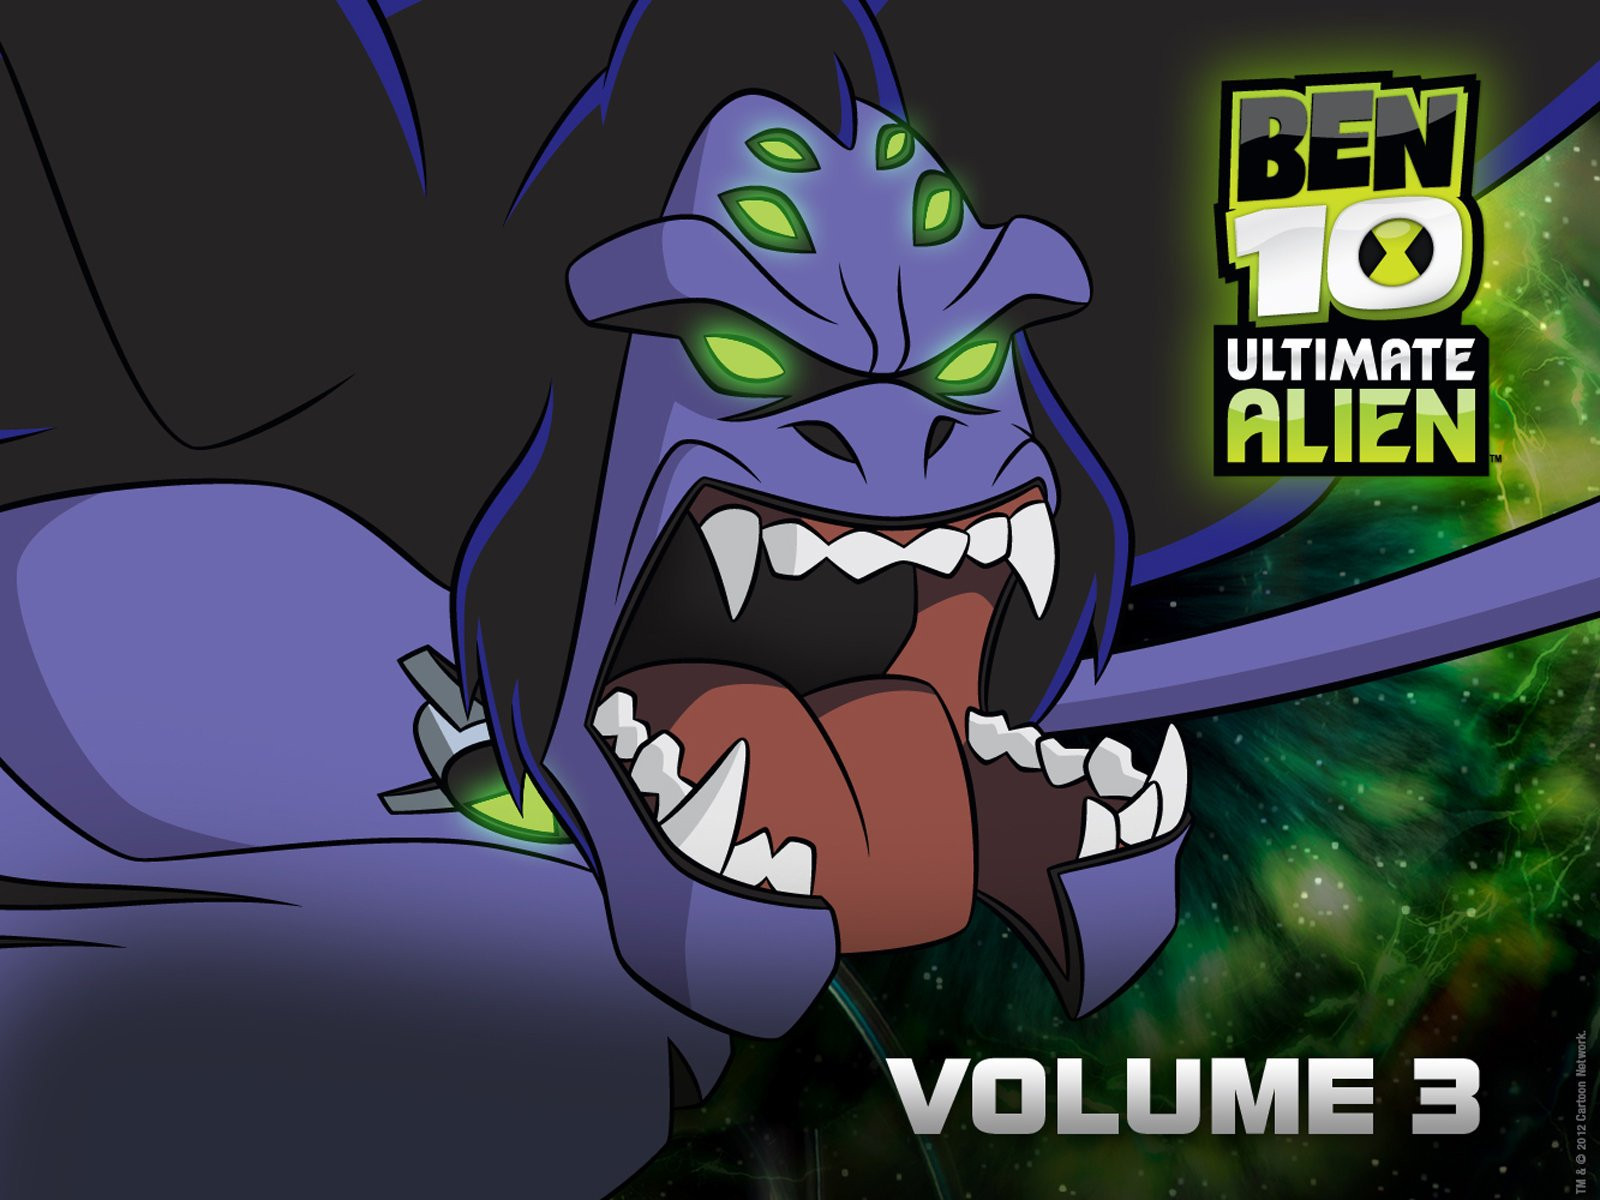 ben 10 ultimate alien season 3 free download